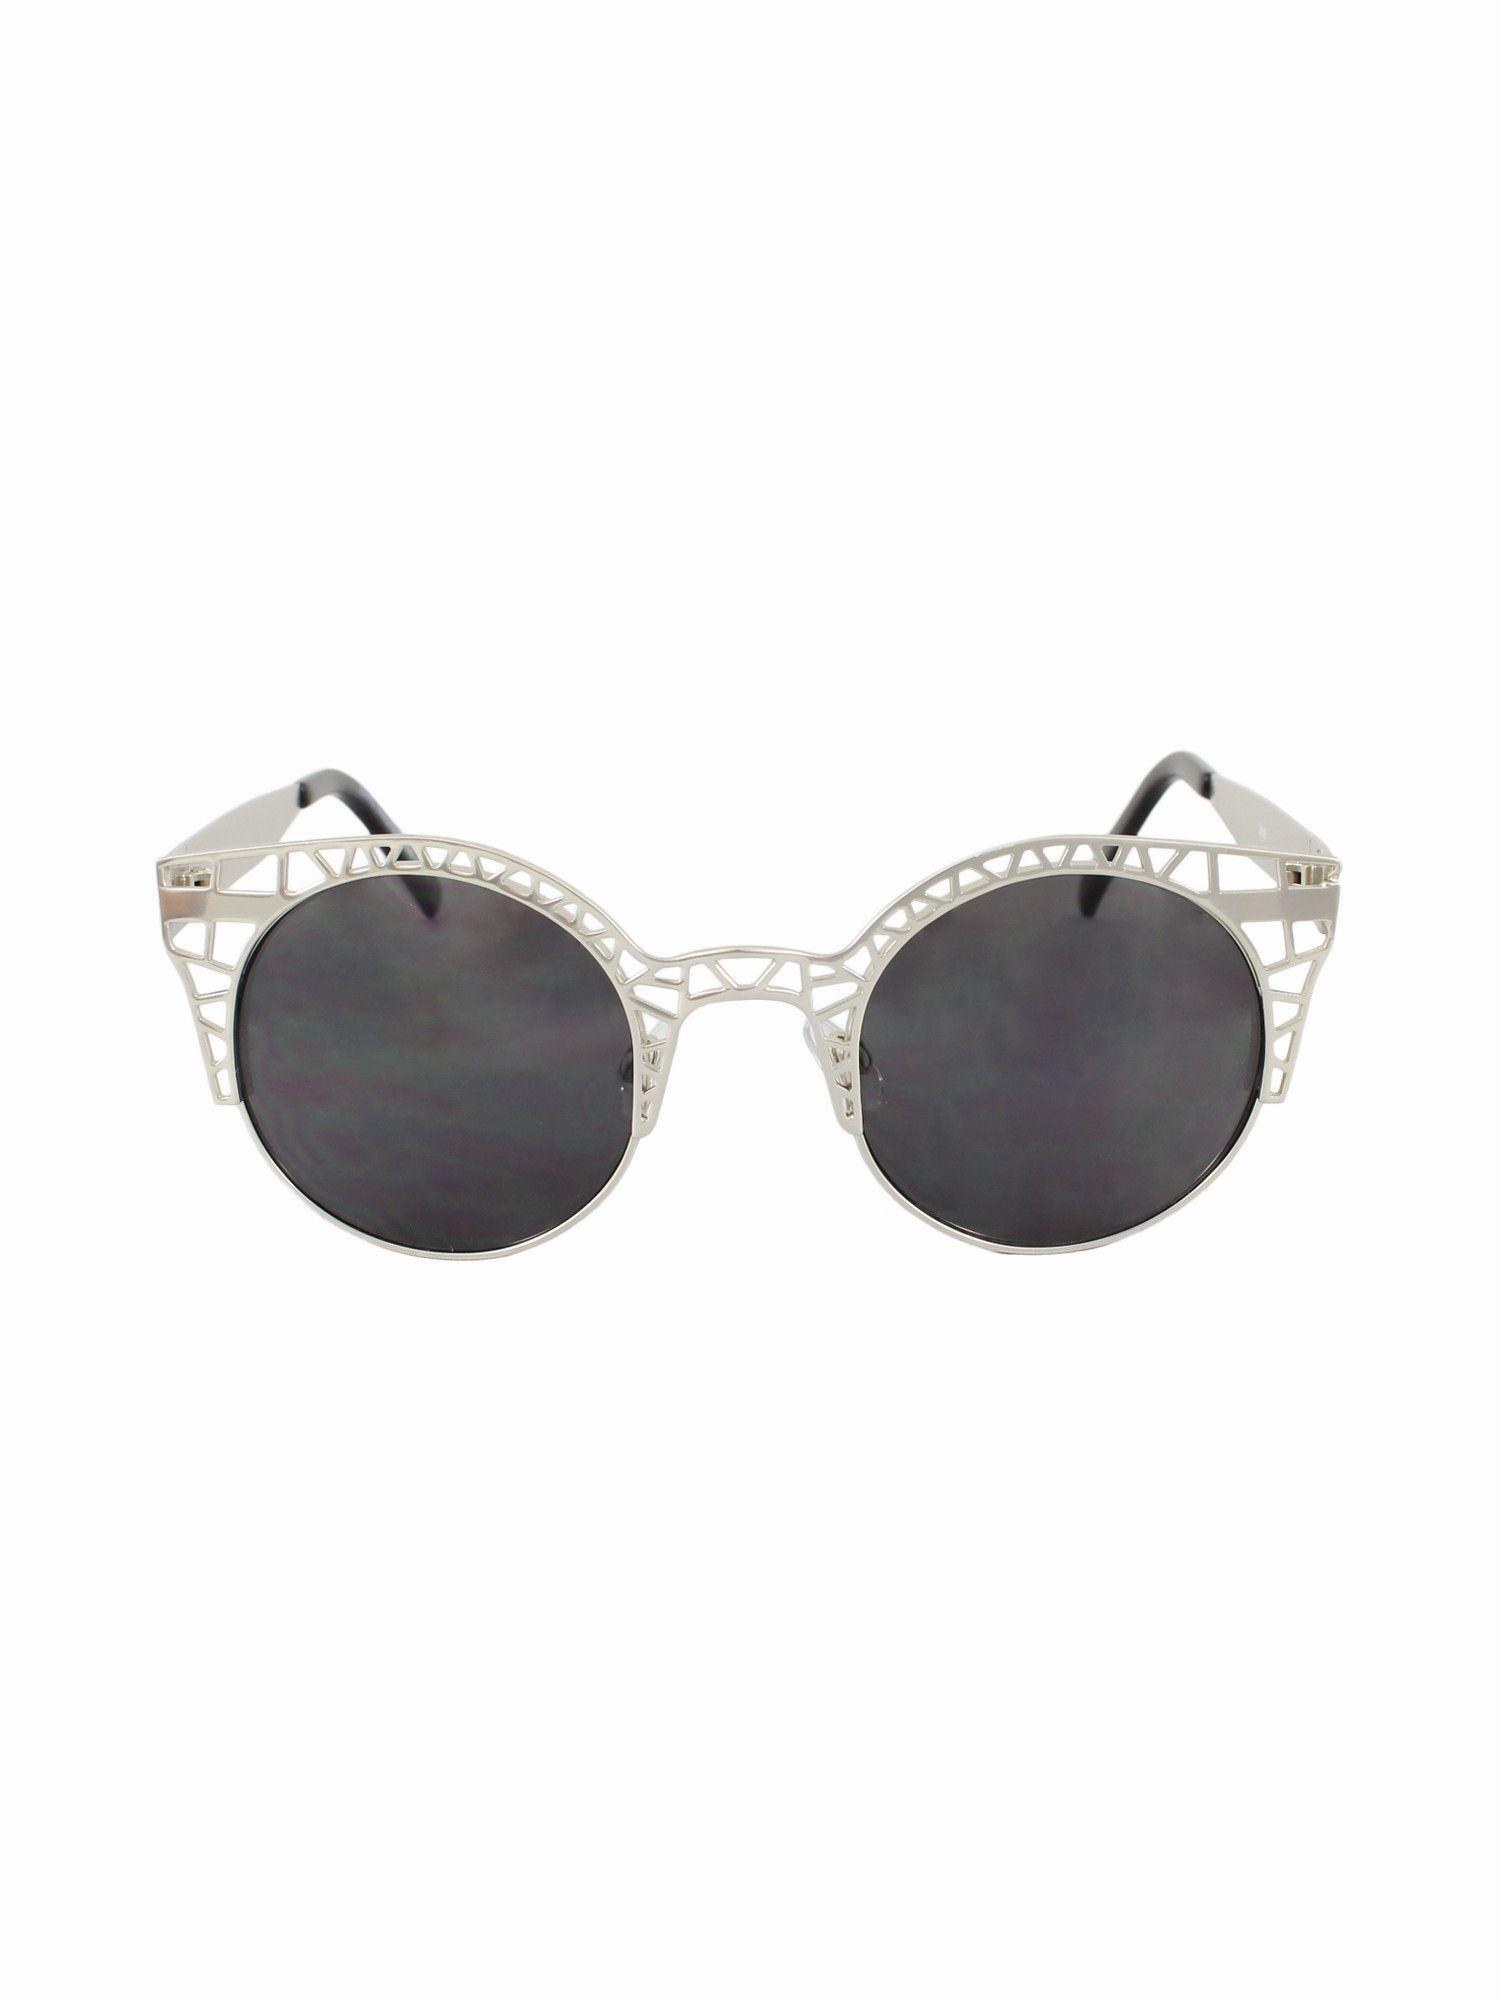 Cat Eye Lens Half Caged Sunnies